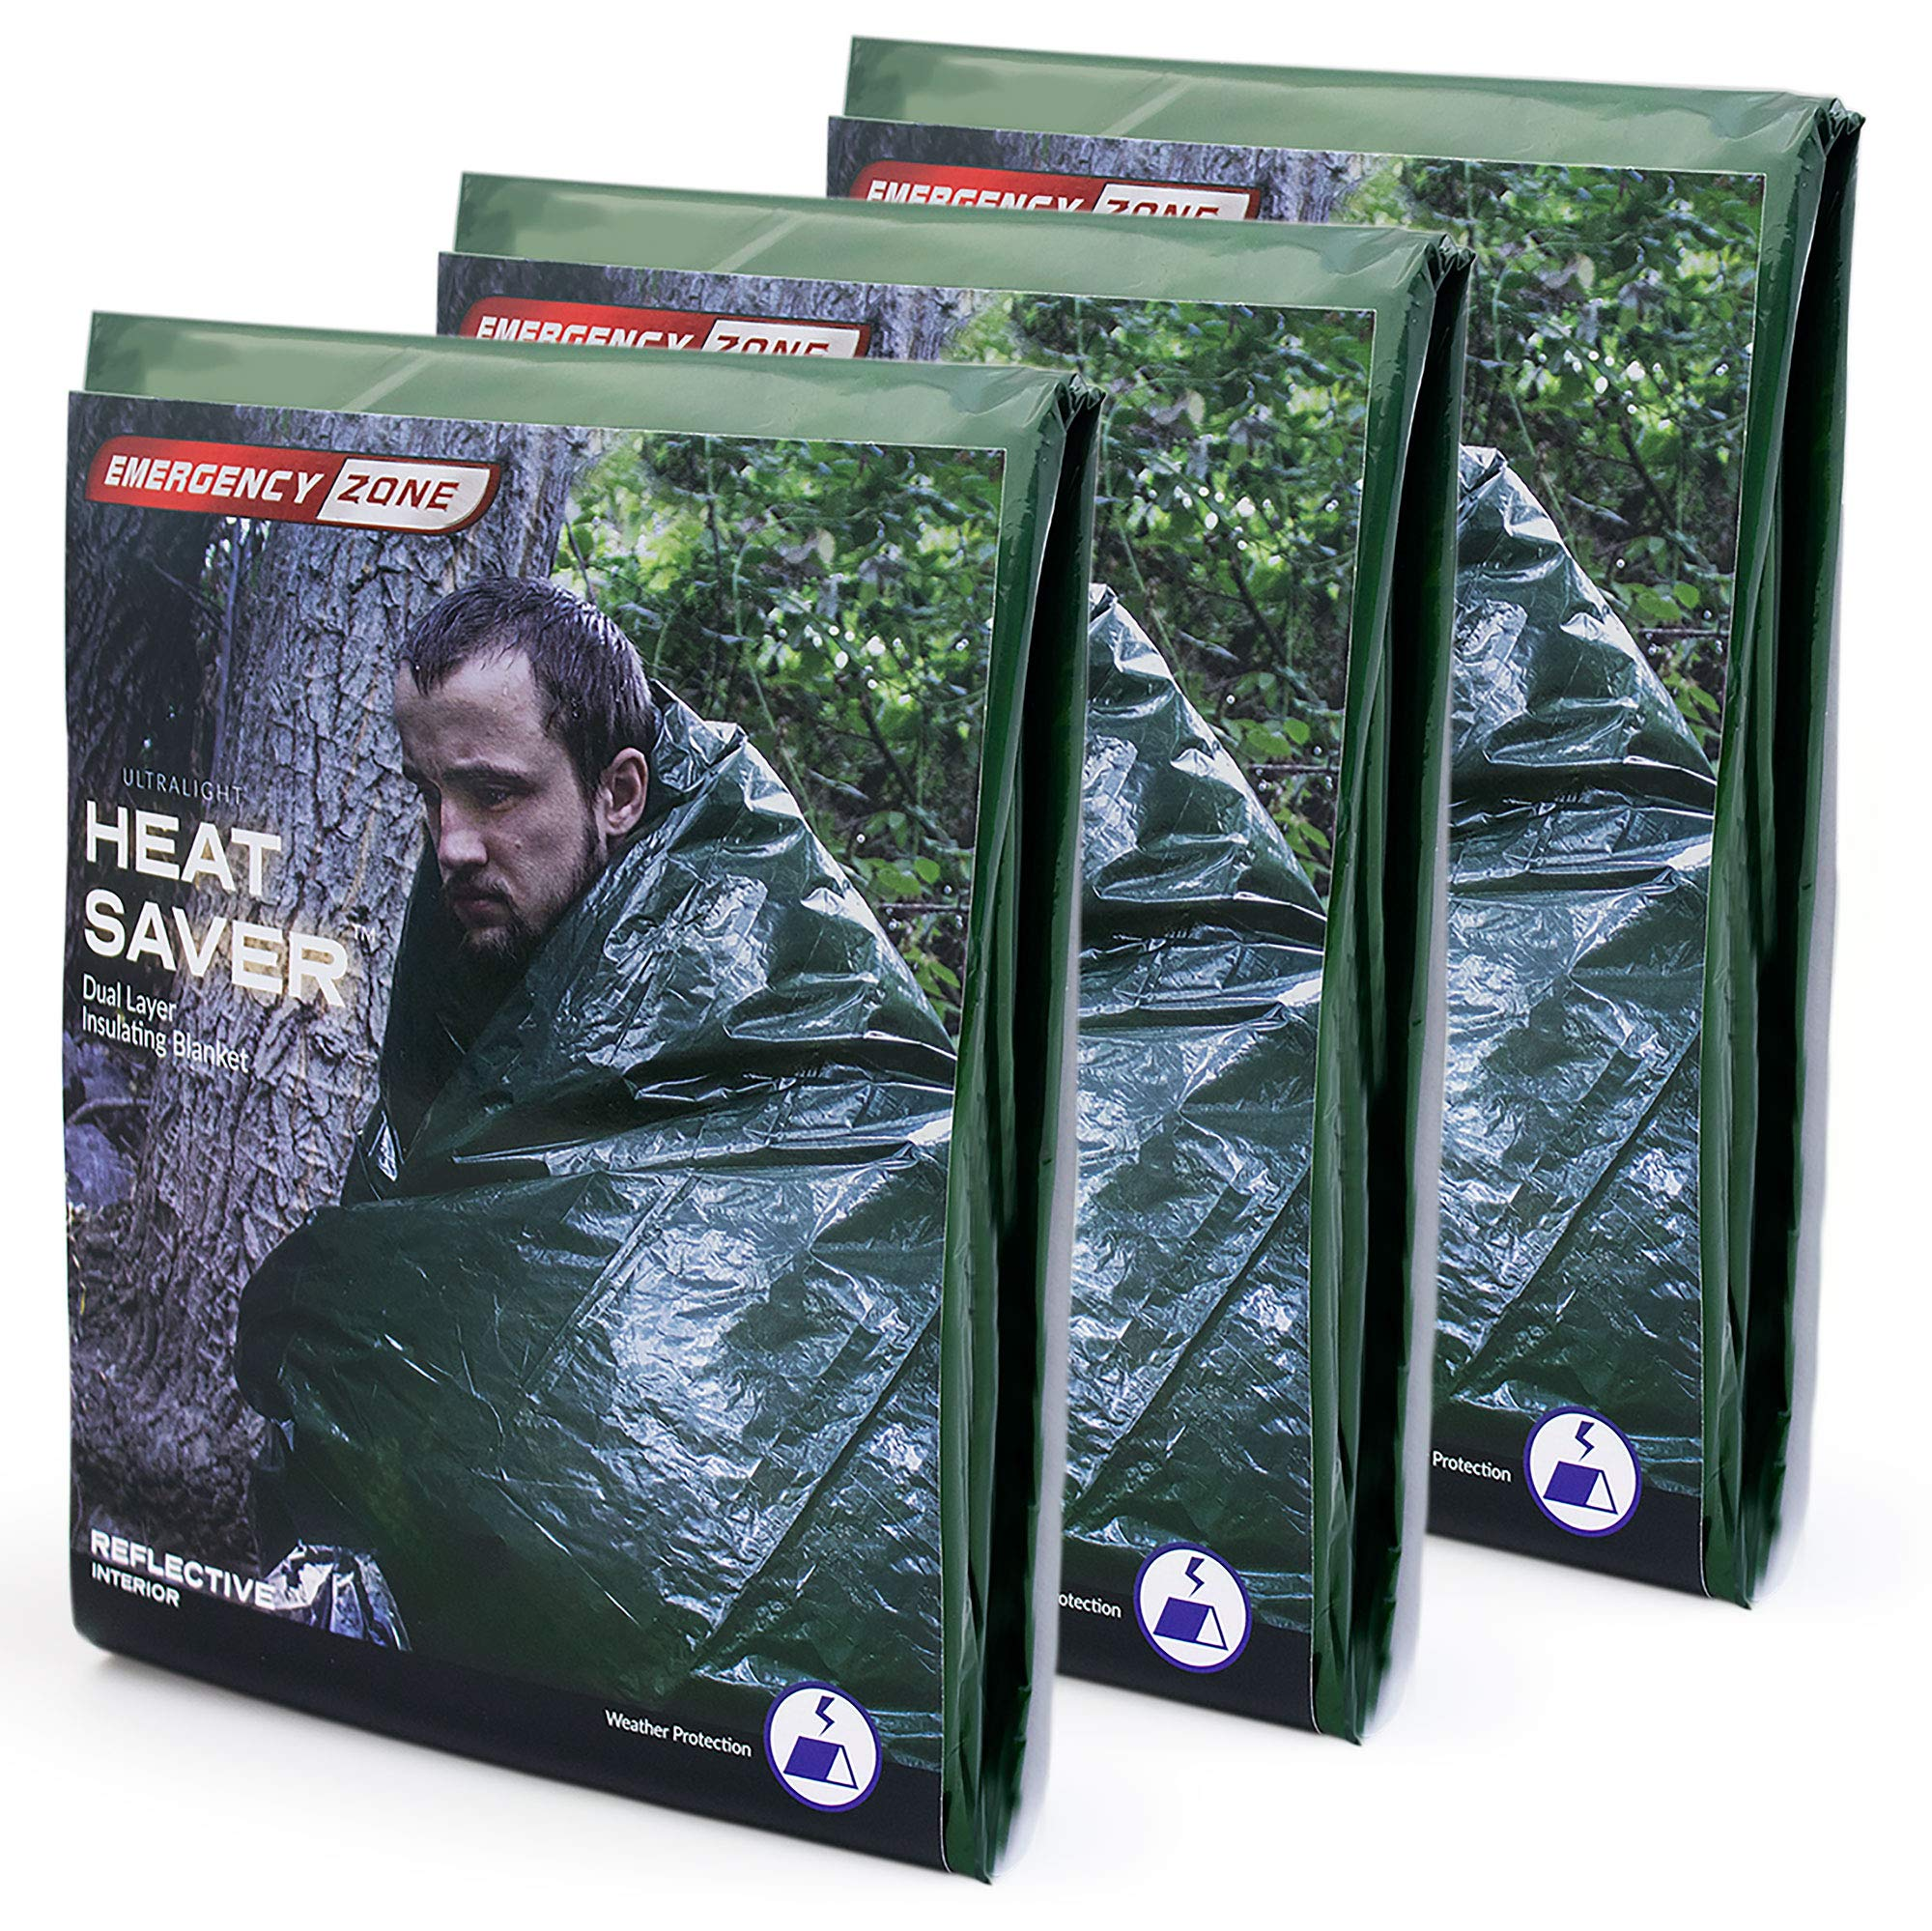 Emergency Zone Ultralight HeatSaver Dual Layer Insulating Emergency Blanket. 3 Pack